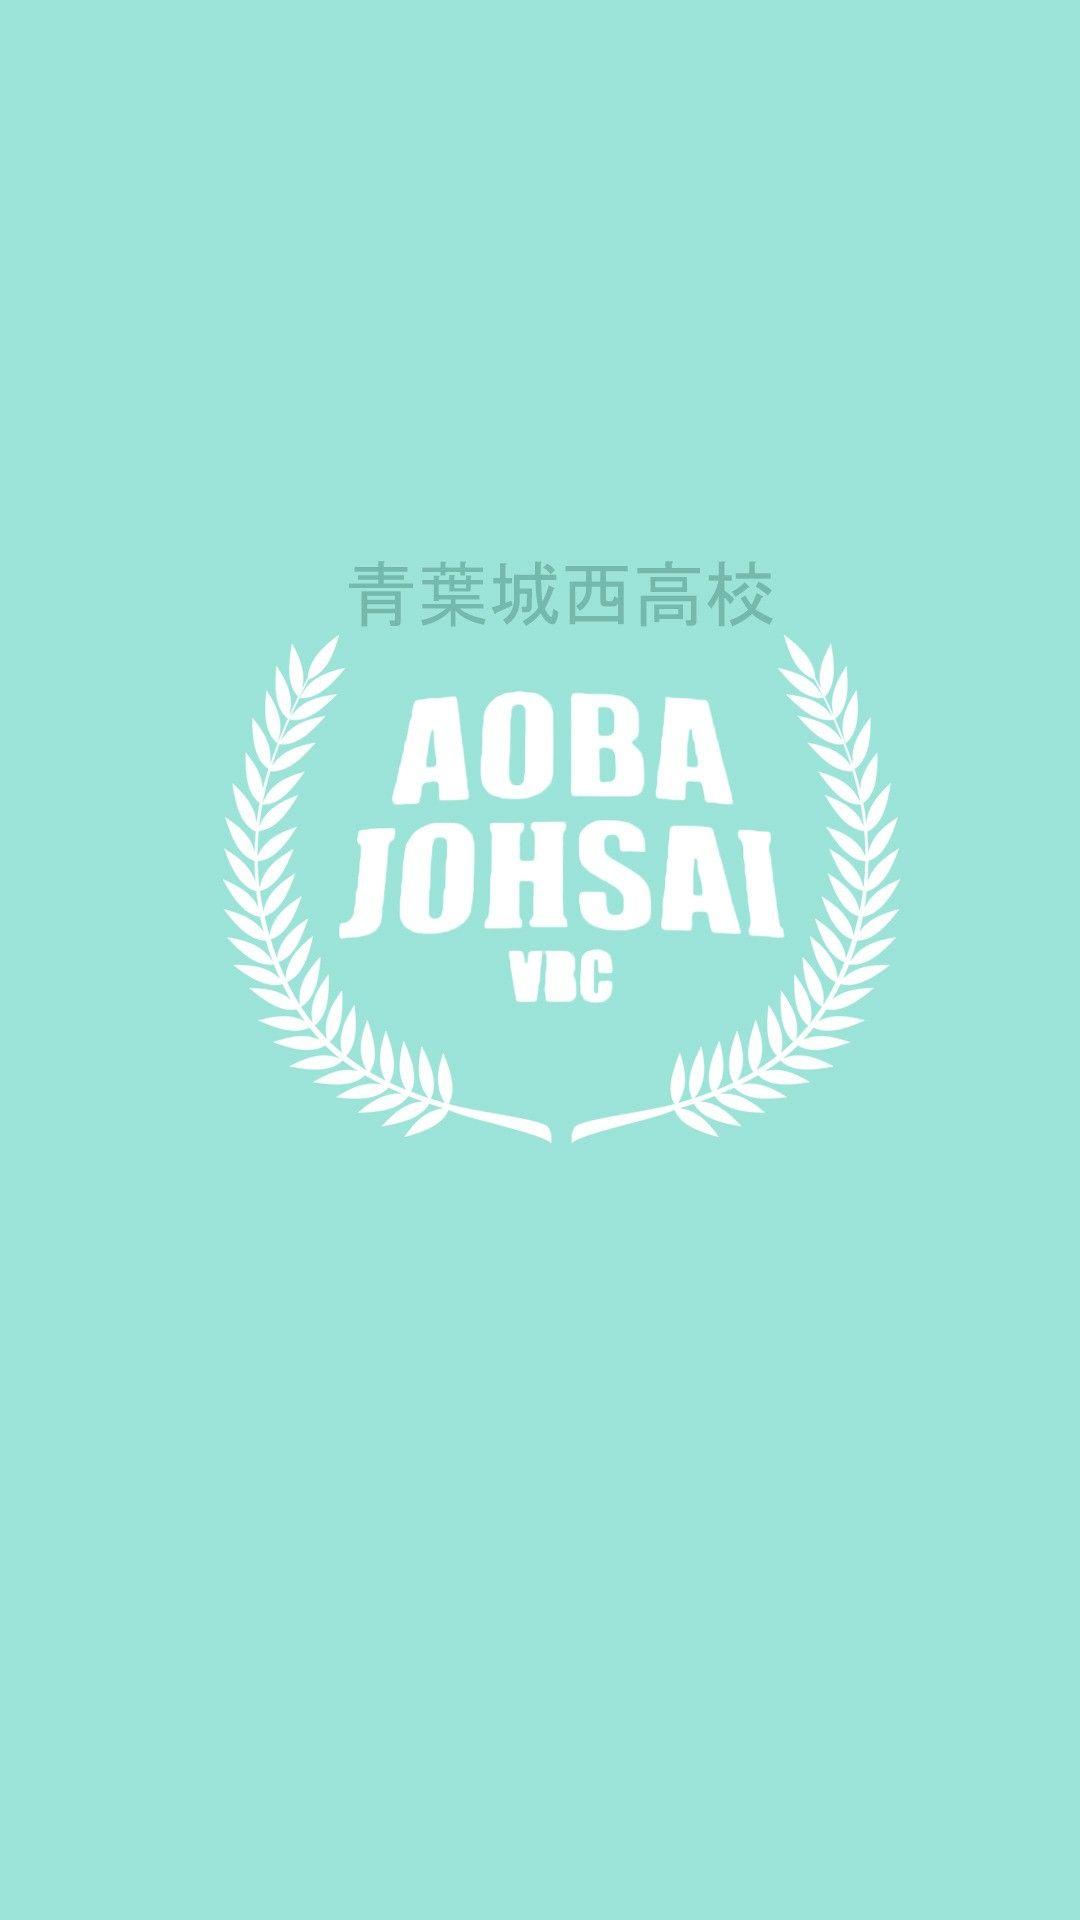 Aoba Johsai Wallpaper In 2020 Haikyuu Wallpaper Haikyuu Haikyuu Karasuno